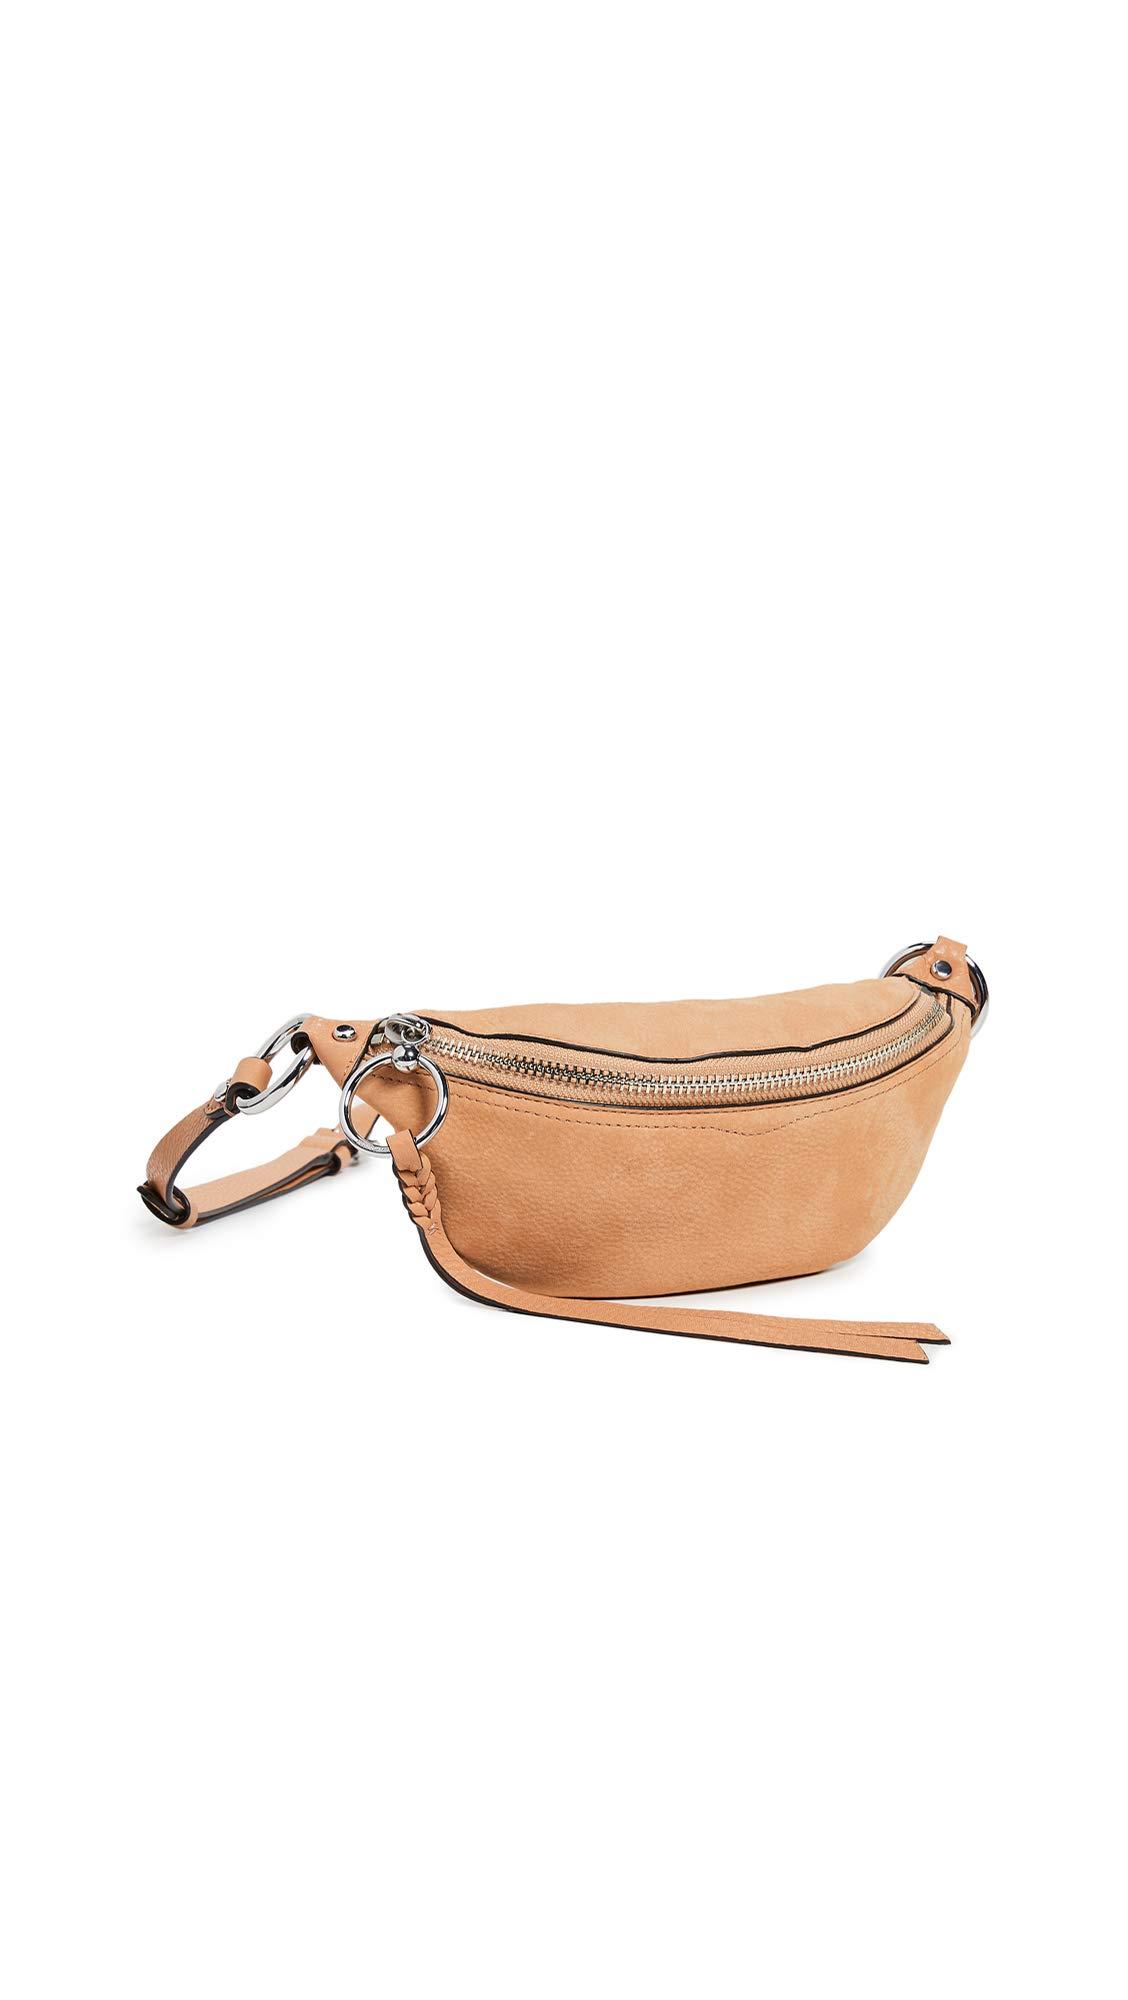 Rebecca Minkoff Women's Bree Mini Belt Bag, Honey, Tan, One Size